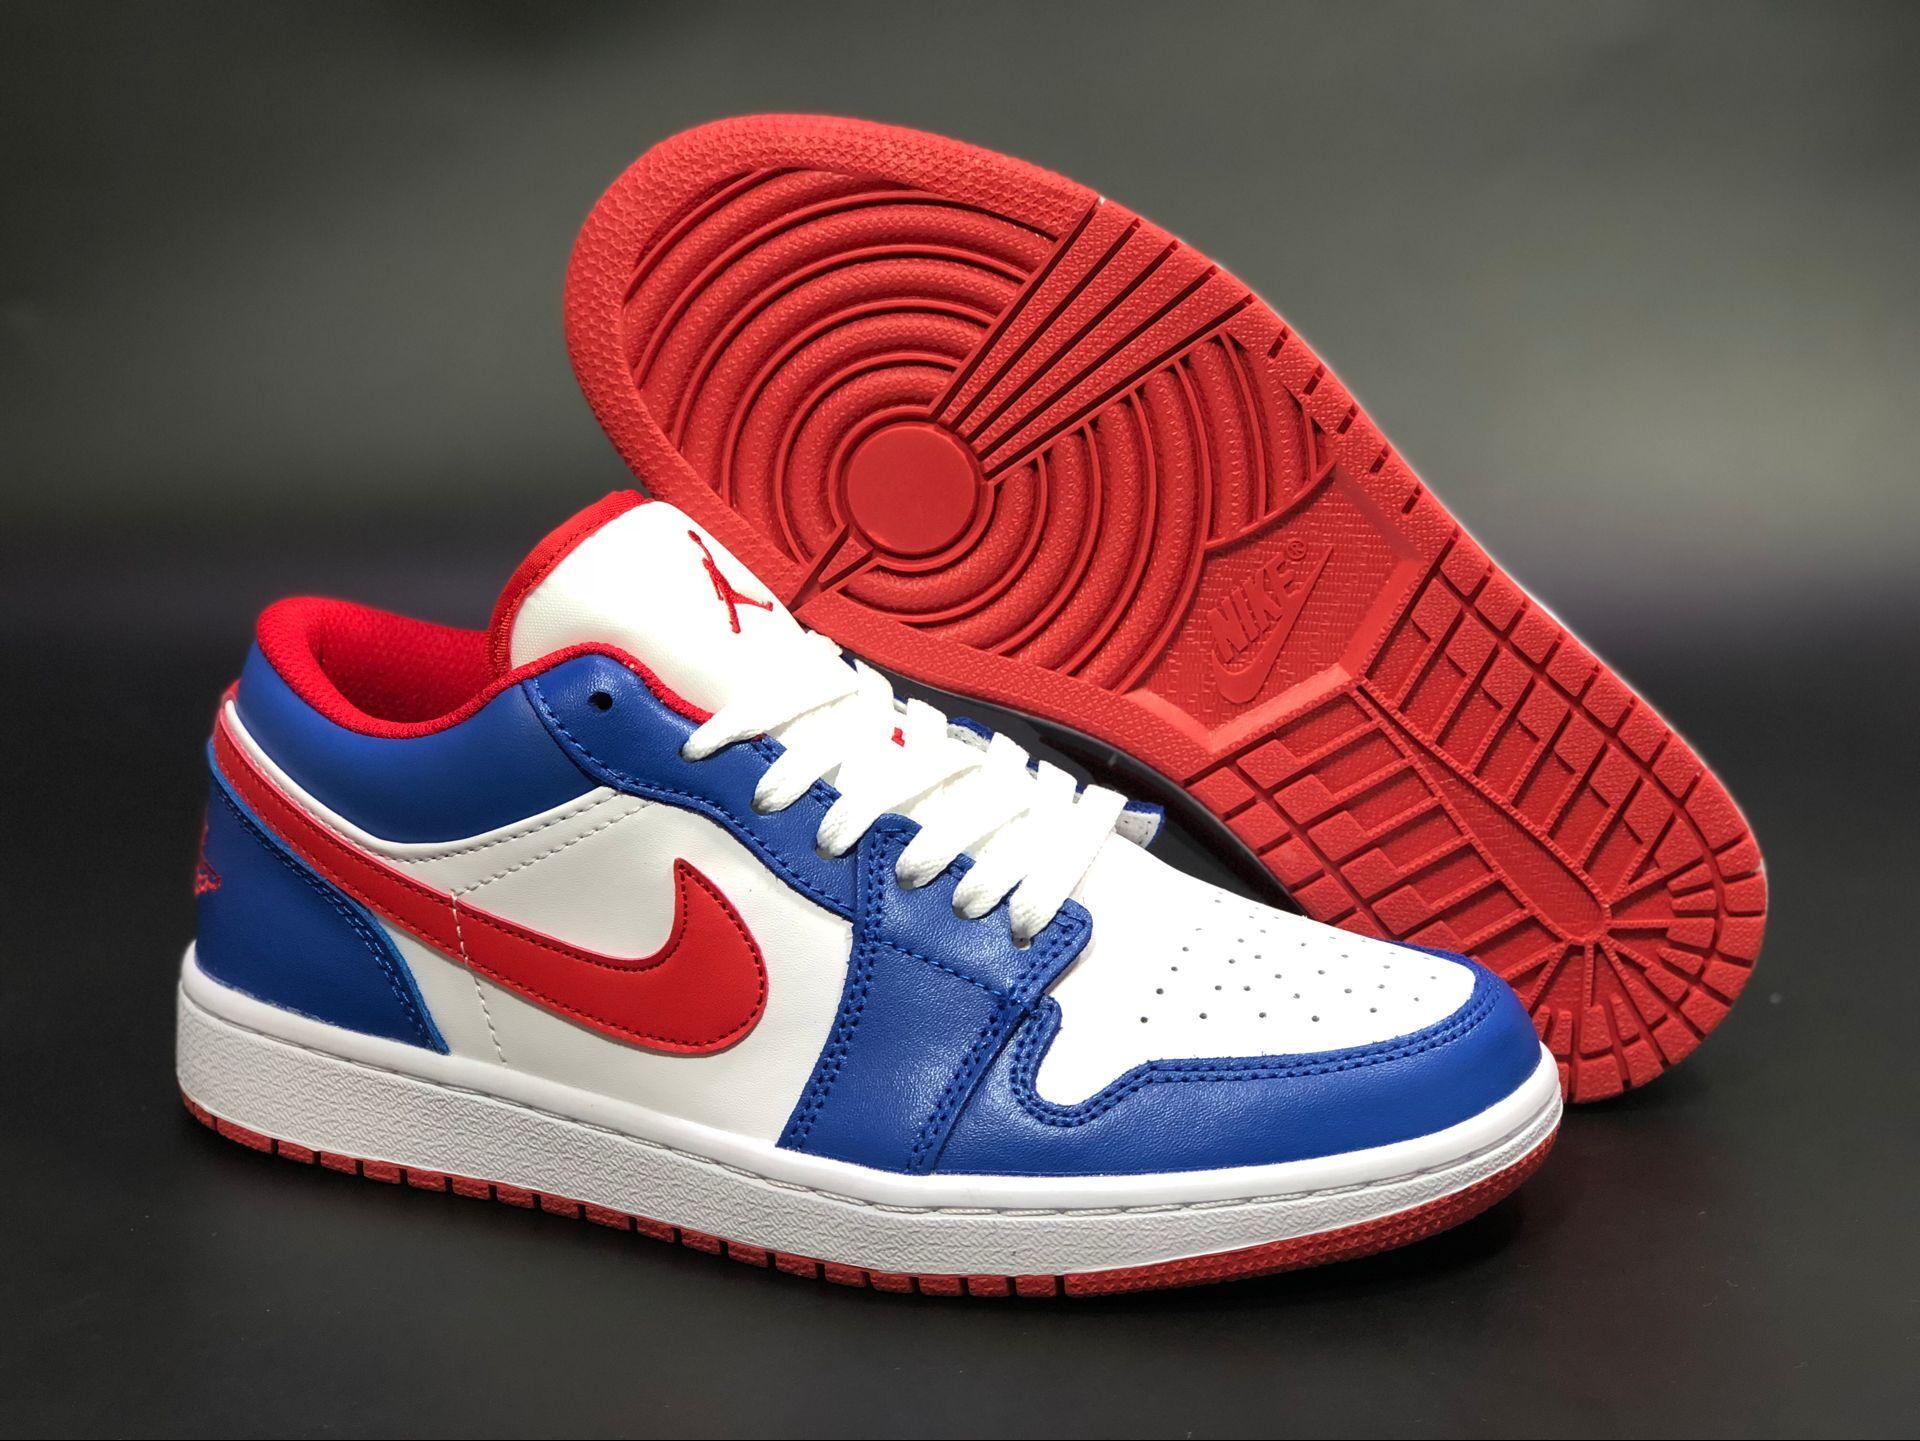 Air Jordan 1 Low America Captain White Blue Red Shoes